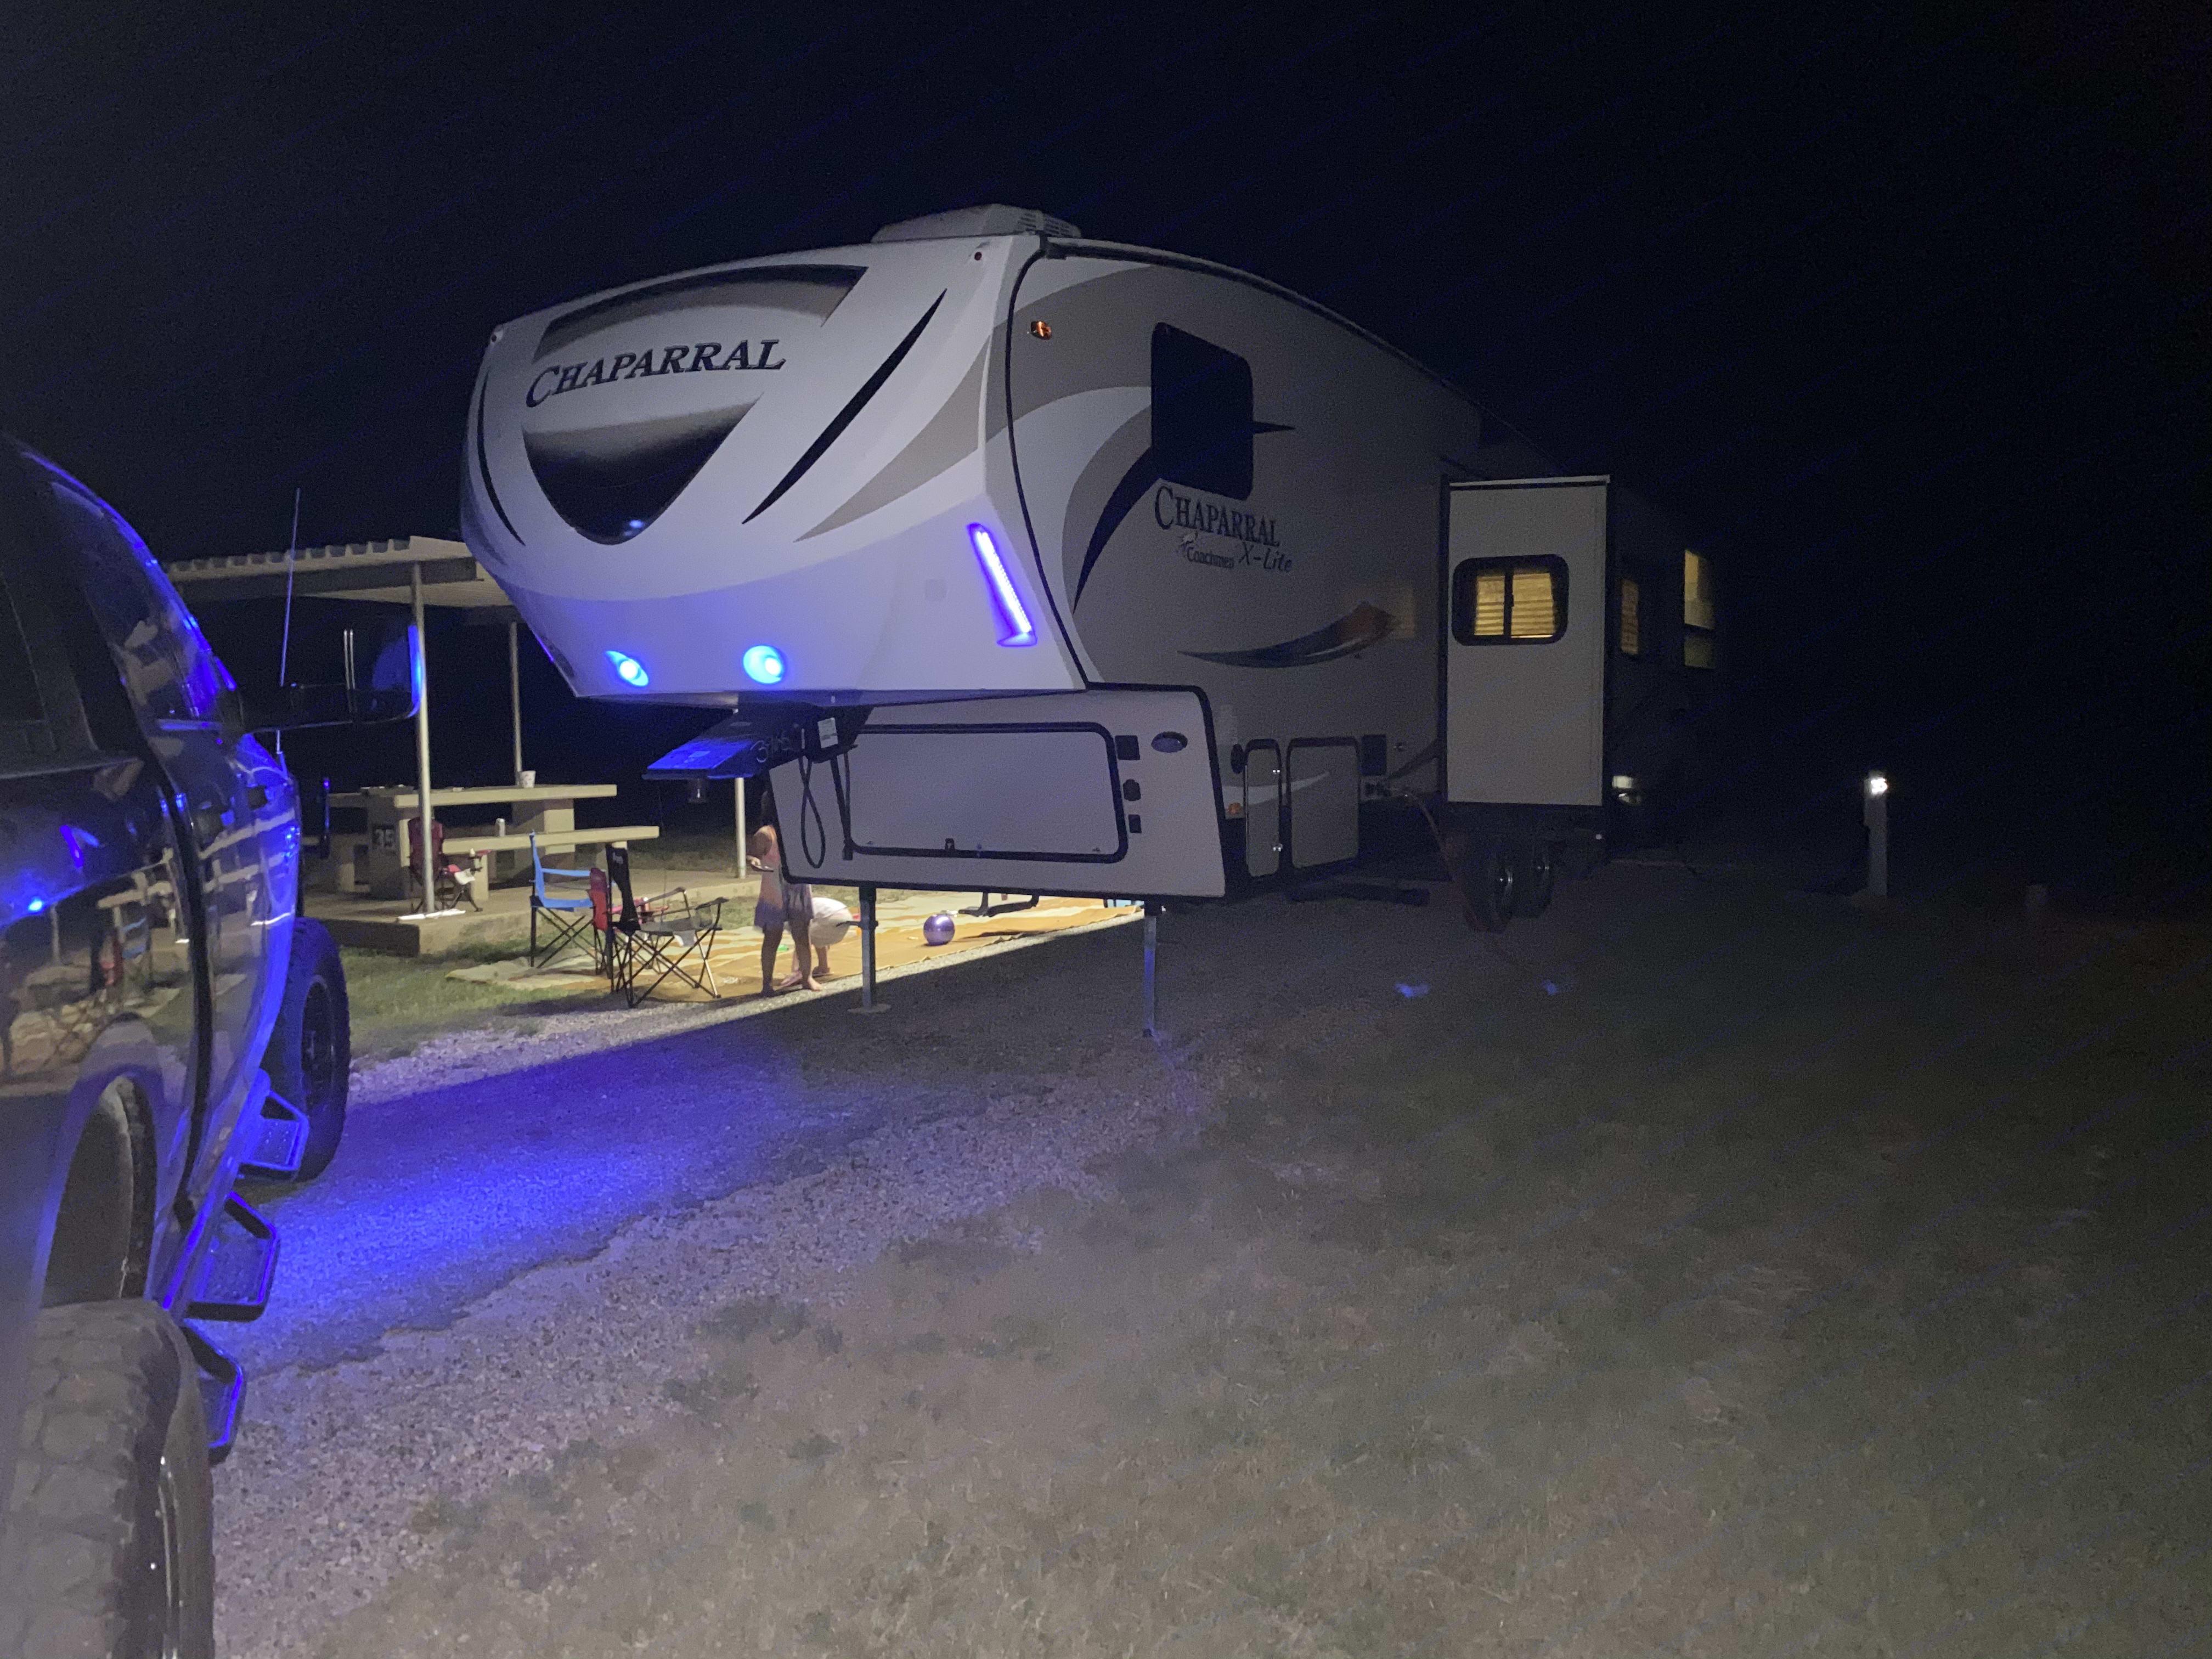 Blue LEDs in the nose. Coachmen Chaparral 2016